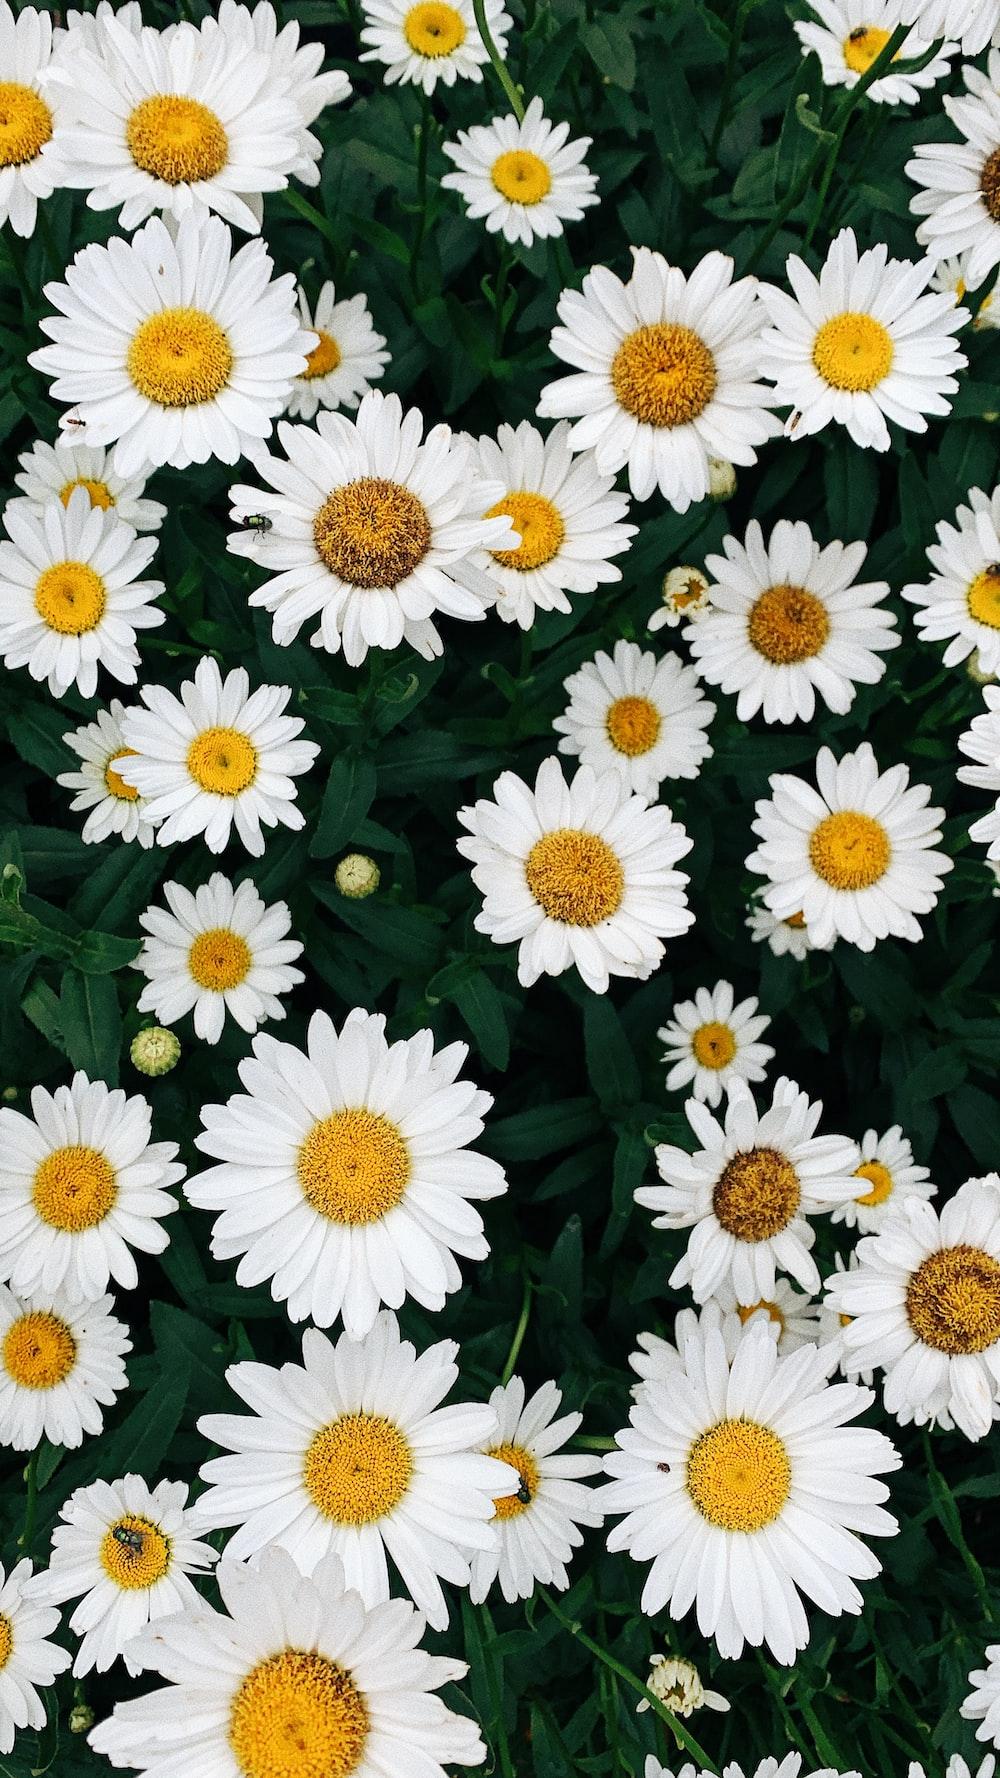 white daisy flowers